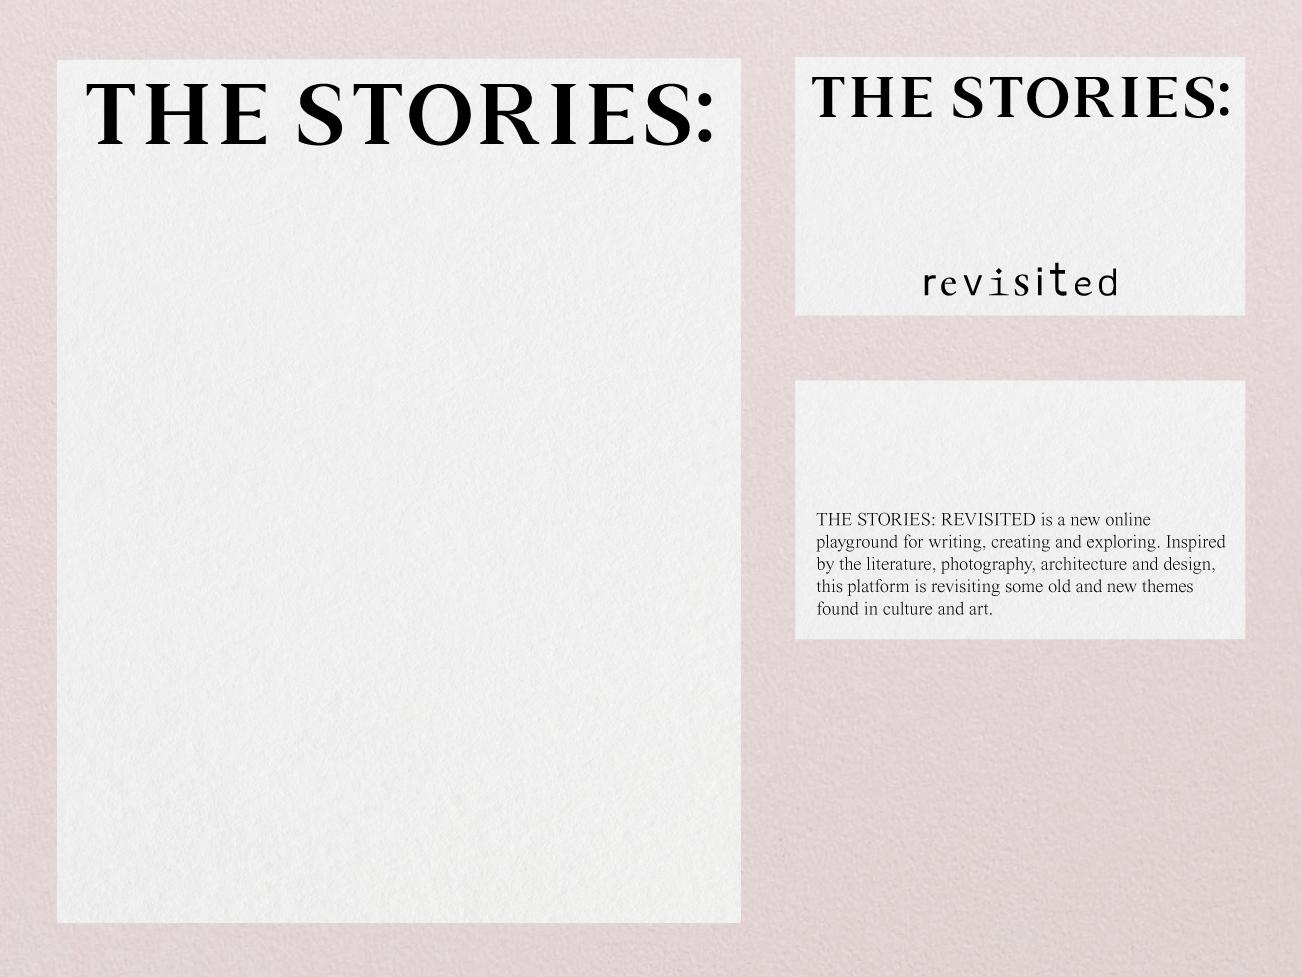 THE STORIES: REVISITED by Vencho Miloshevski on Dribbble